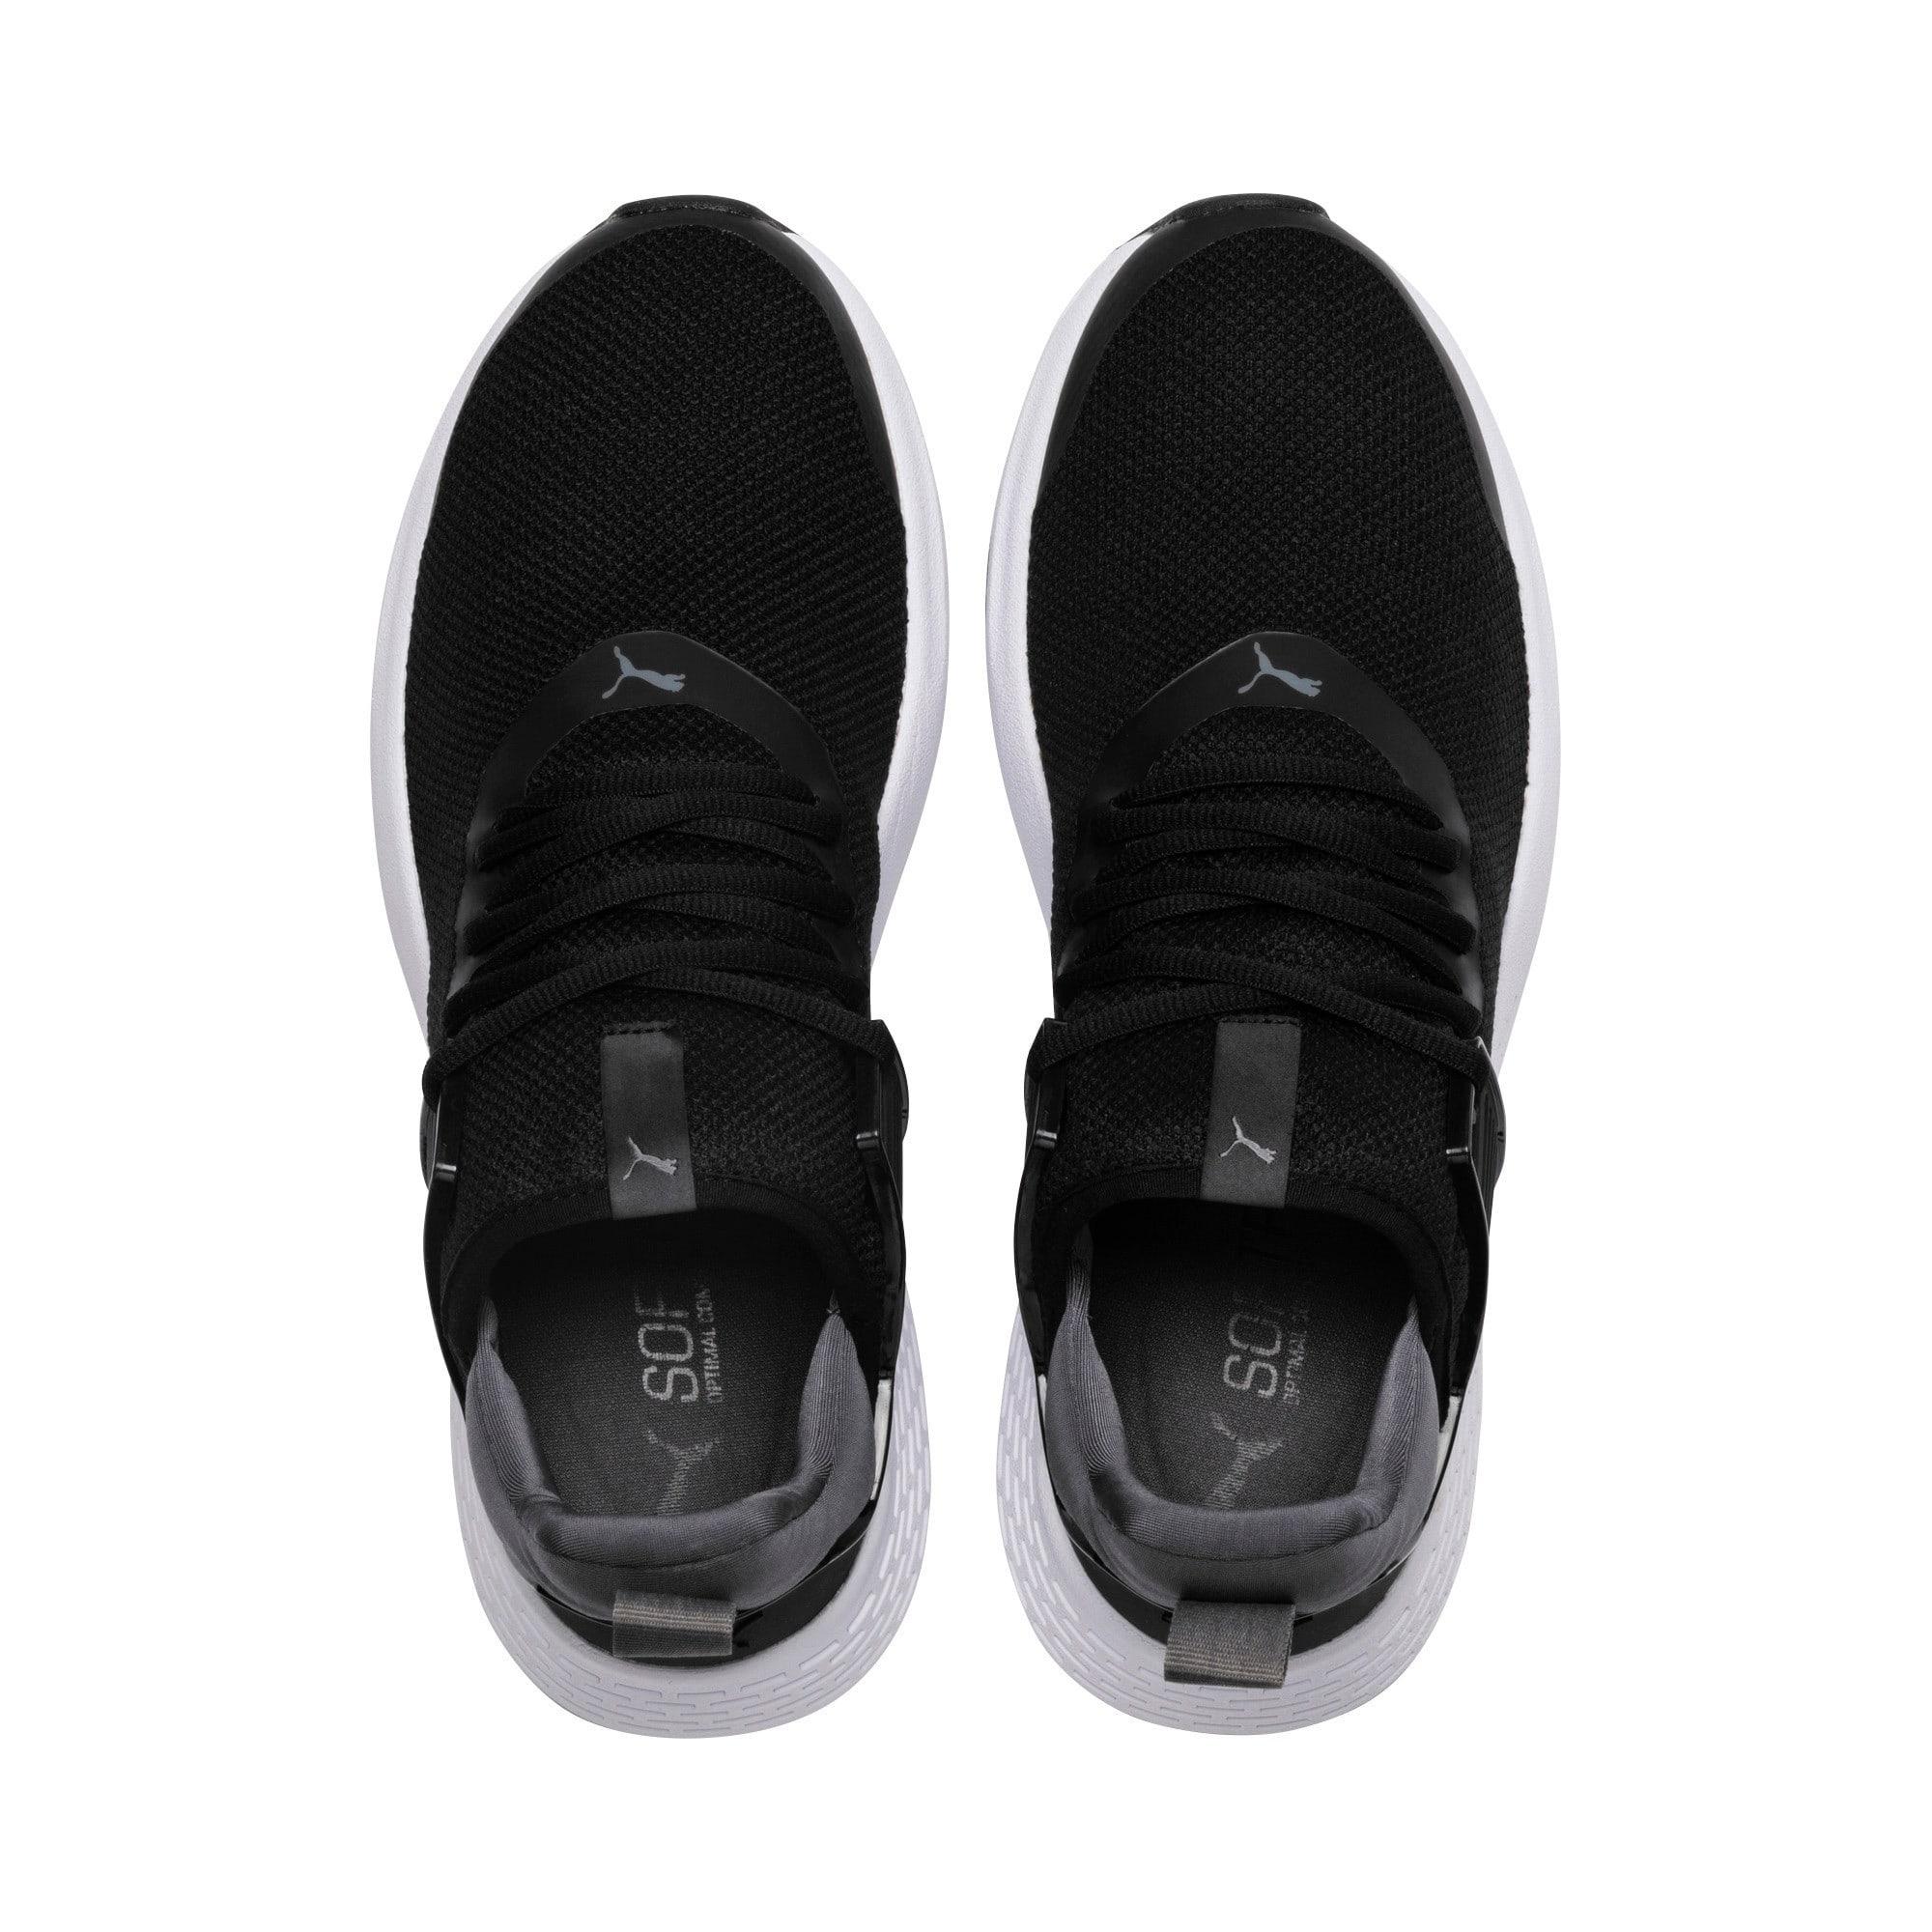 Thumbnail 6 of Insurge Mesh  Sneakers, Black-Iron Gate-White, medium